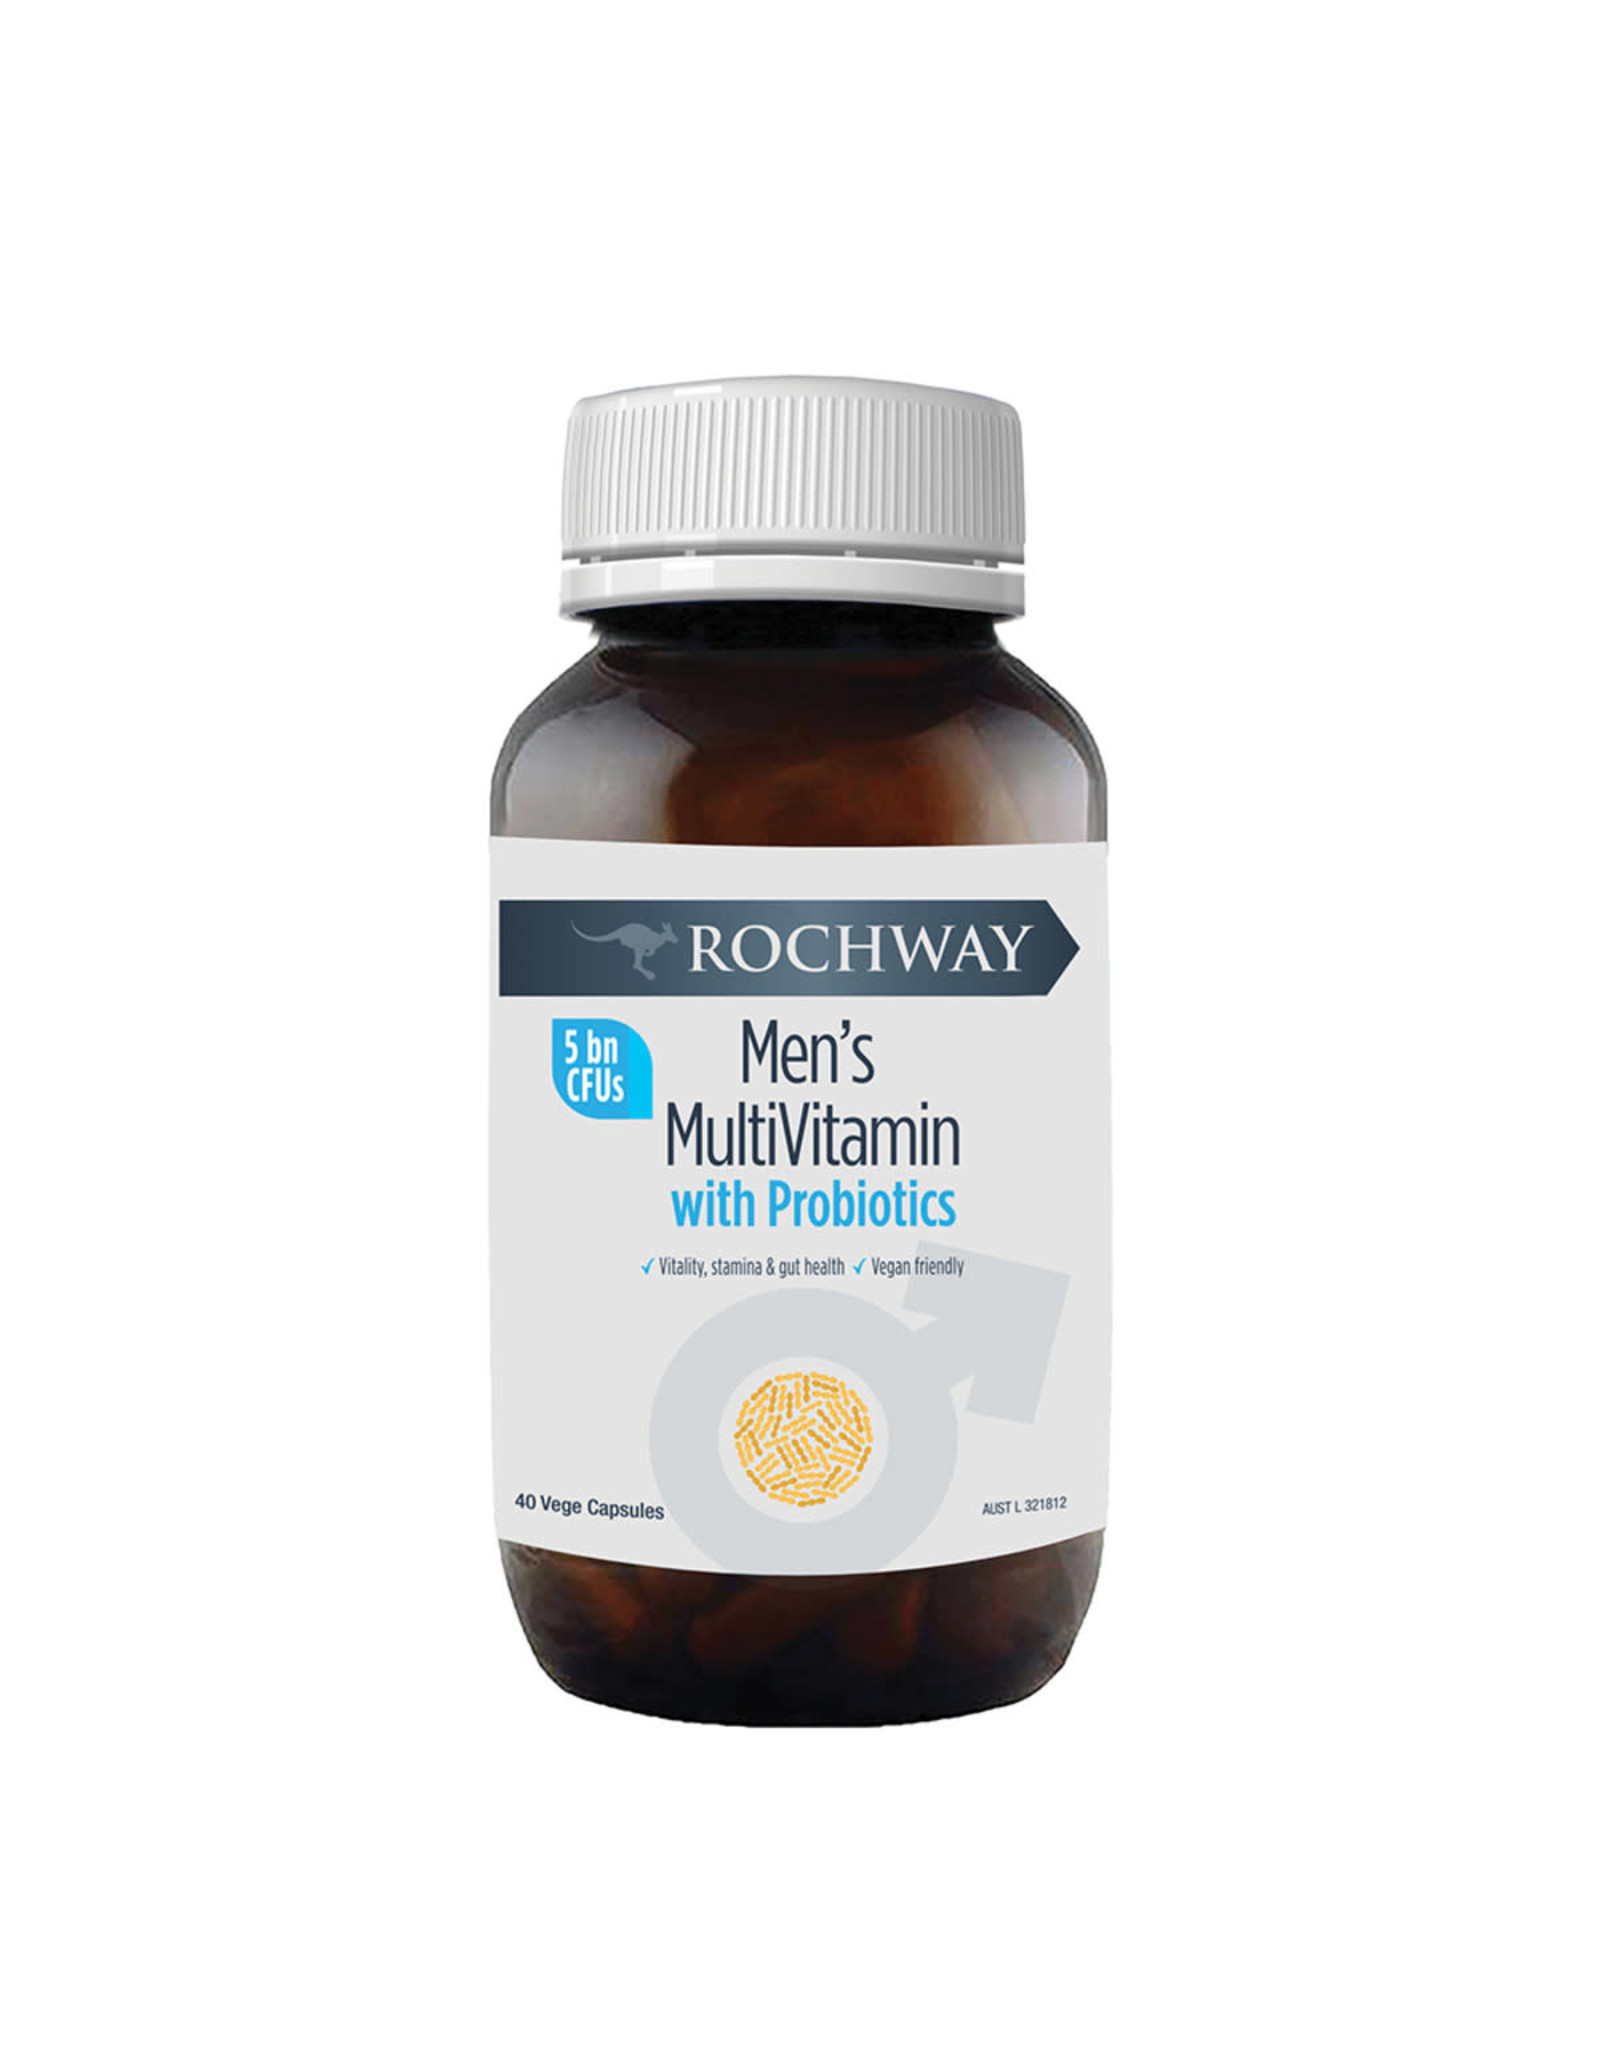 Rochway Men's Multivitamin with Probiotics (5 Billion CFU) 40vc